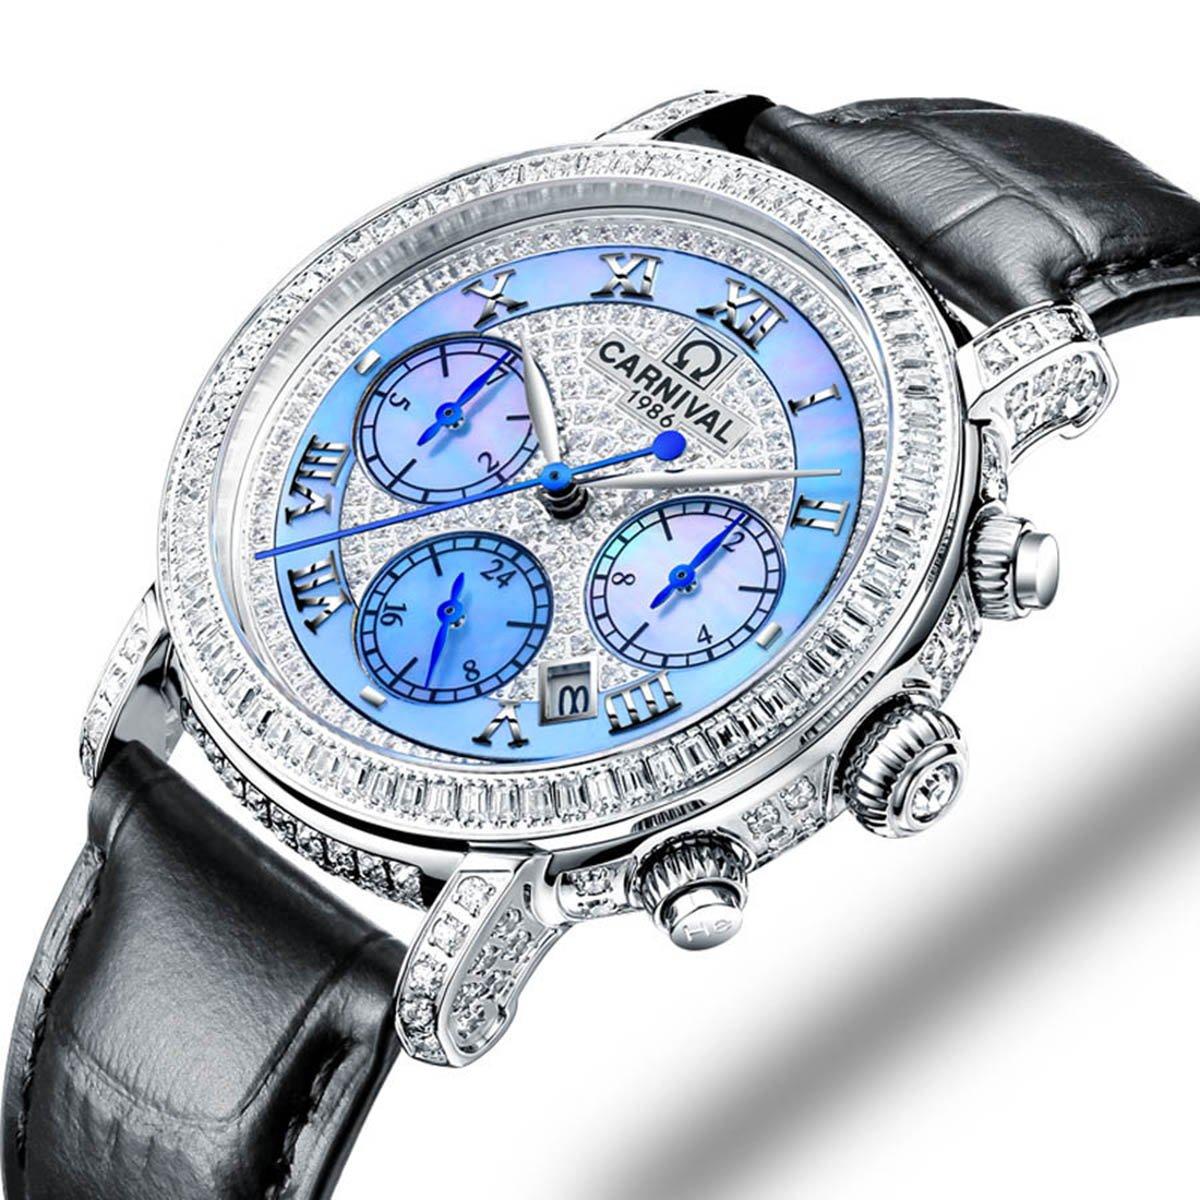 Women 's Diamond Watch自動機械多機能ダイヤルと本革ストラップスイスWatches ブラック B07CG2FJGP ブラック ブラック